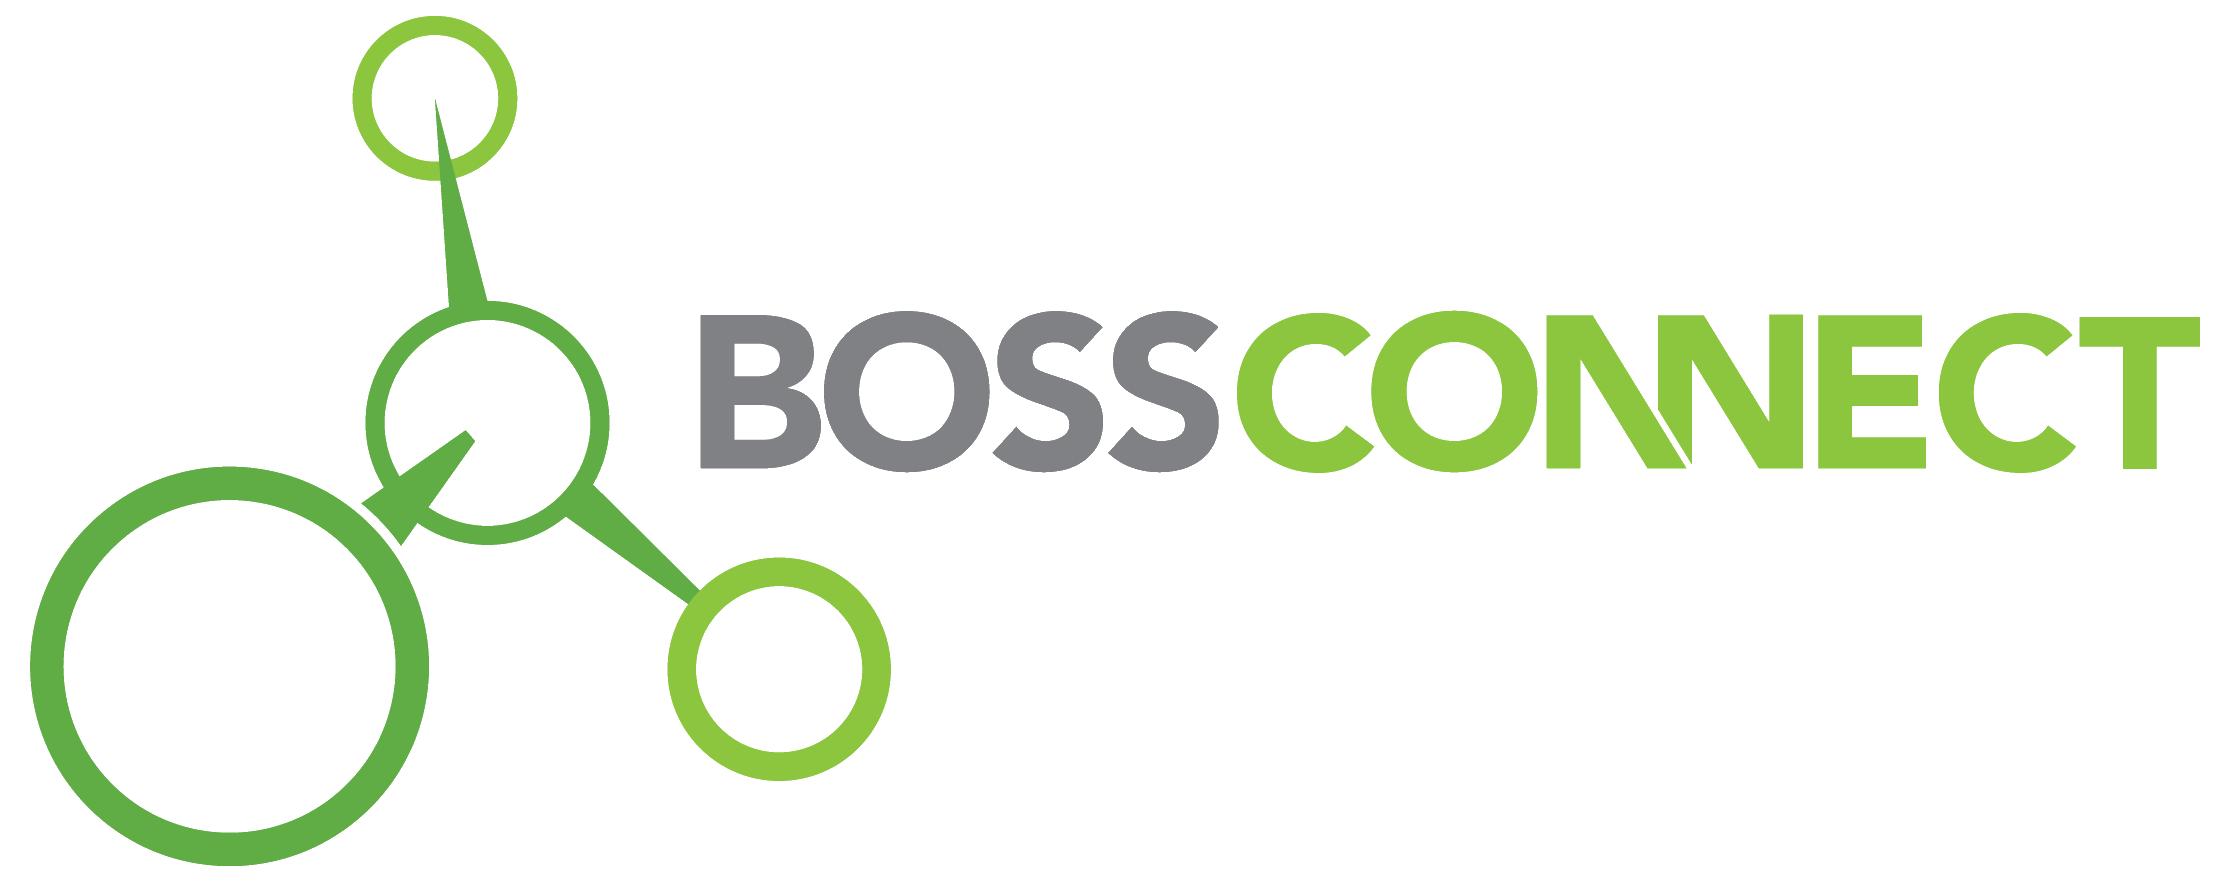 Bossconnect.com